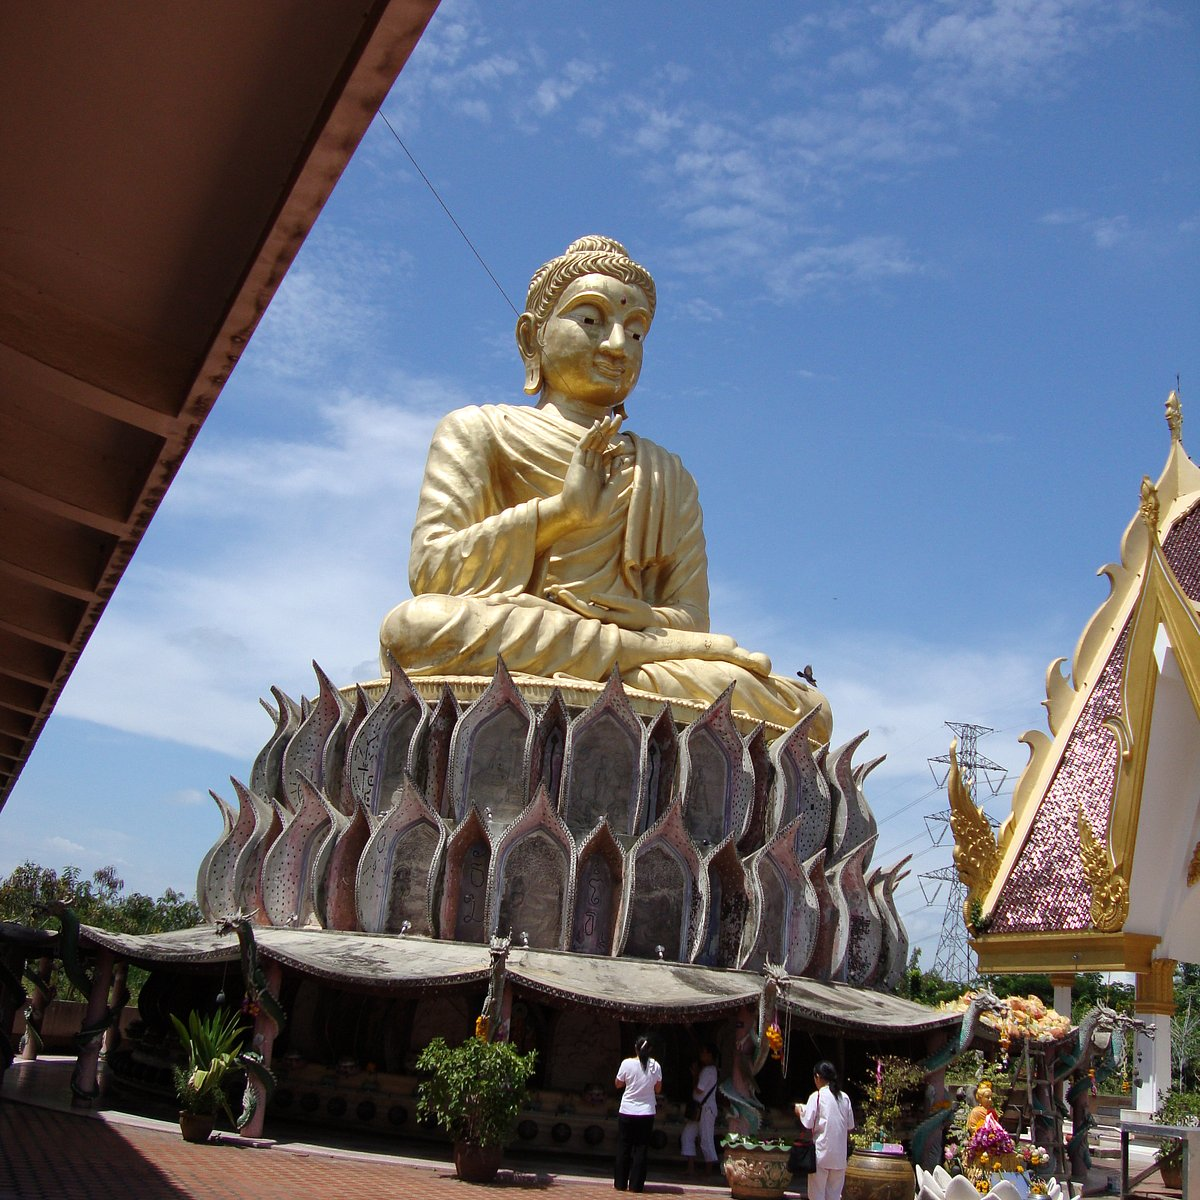 Wat Samphran 口コミ・写真・地図・情報 - トリップアドバイザー